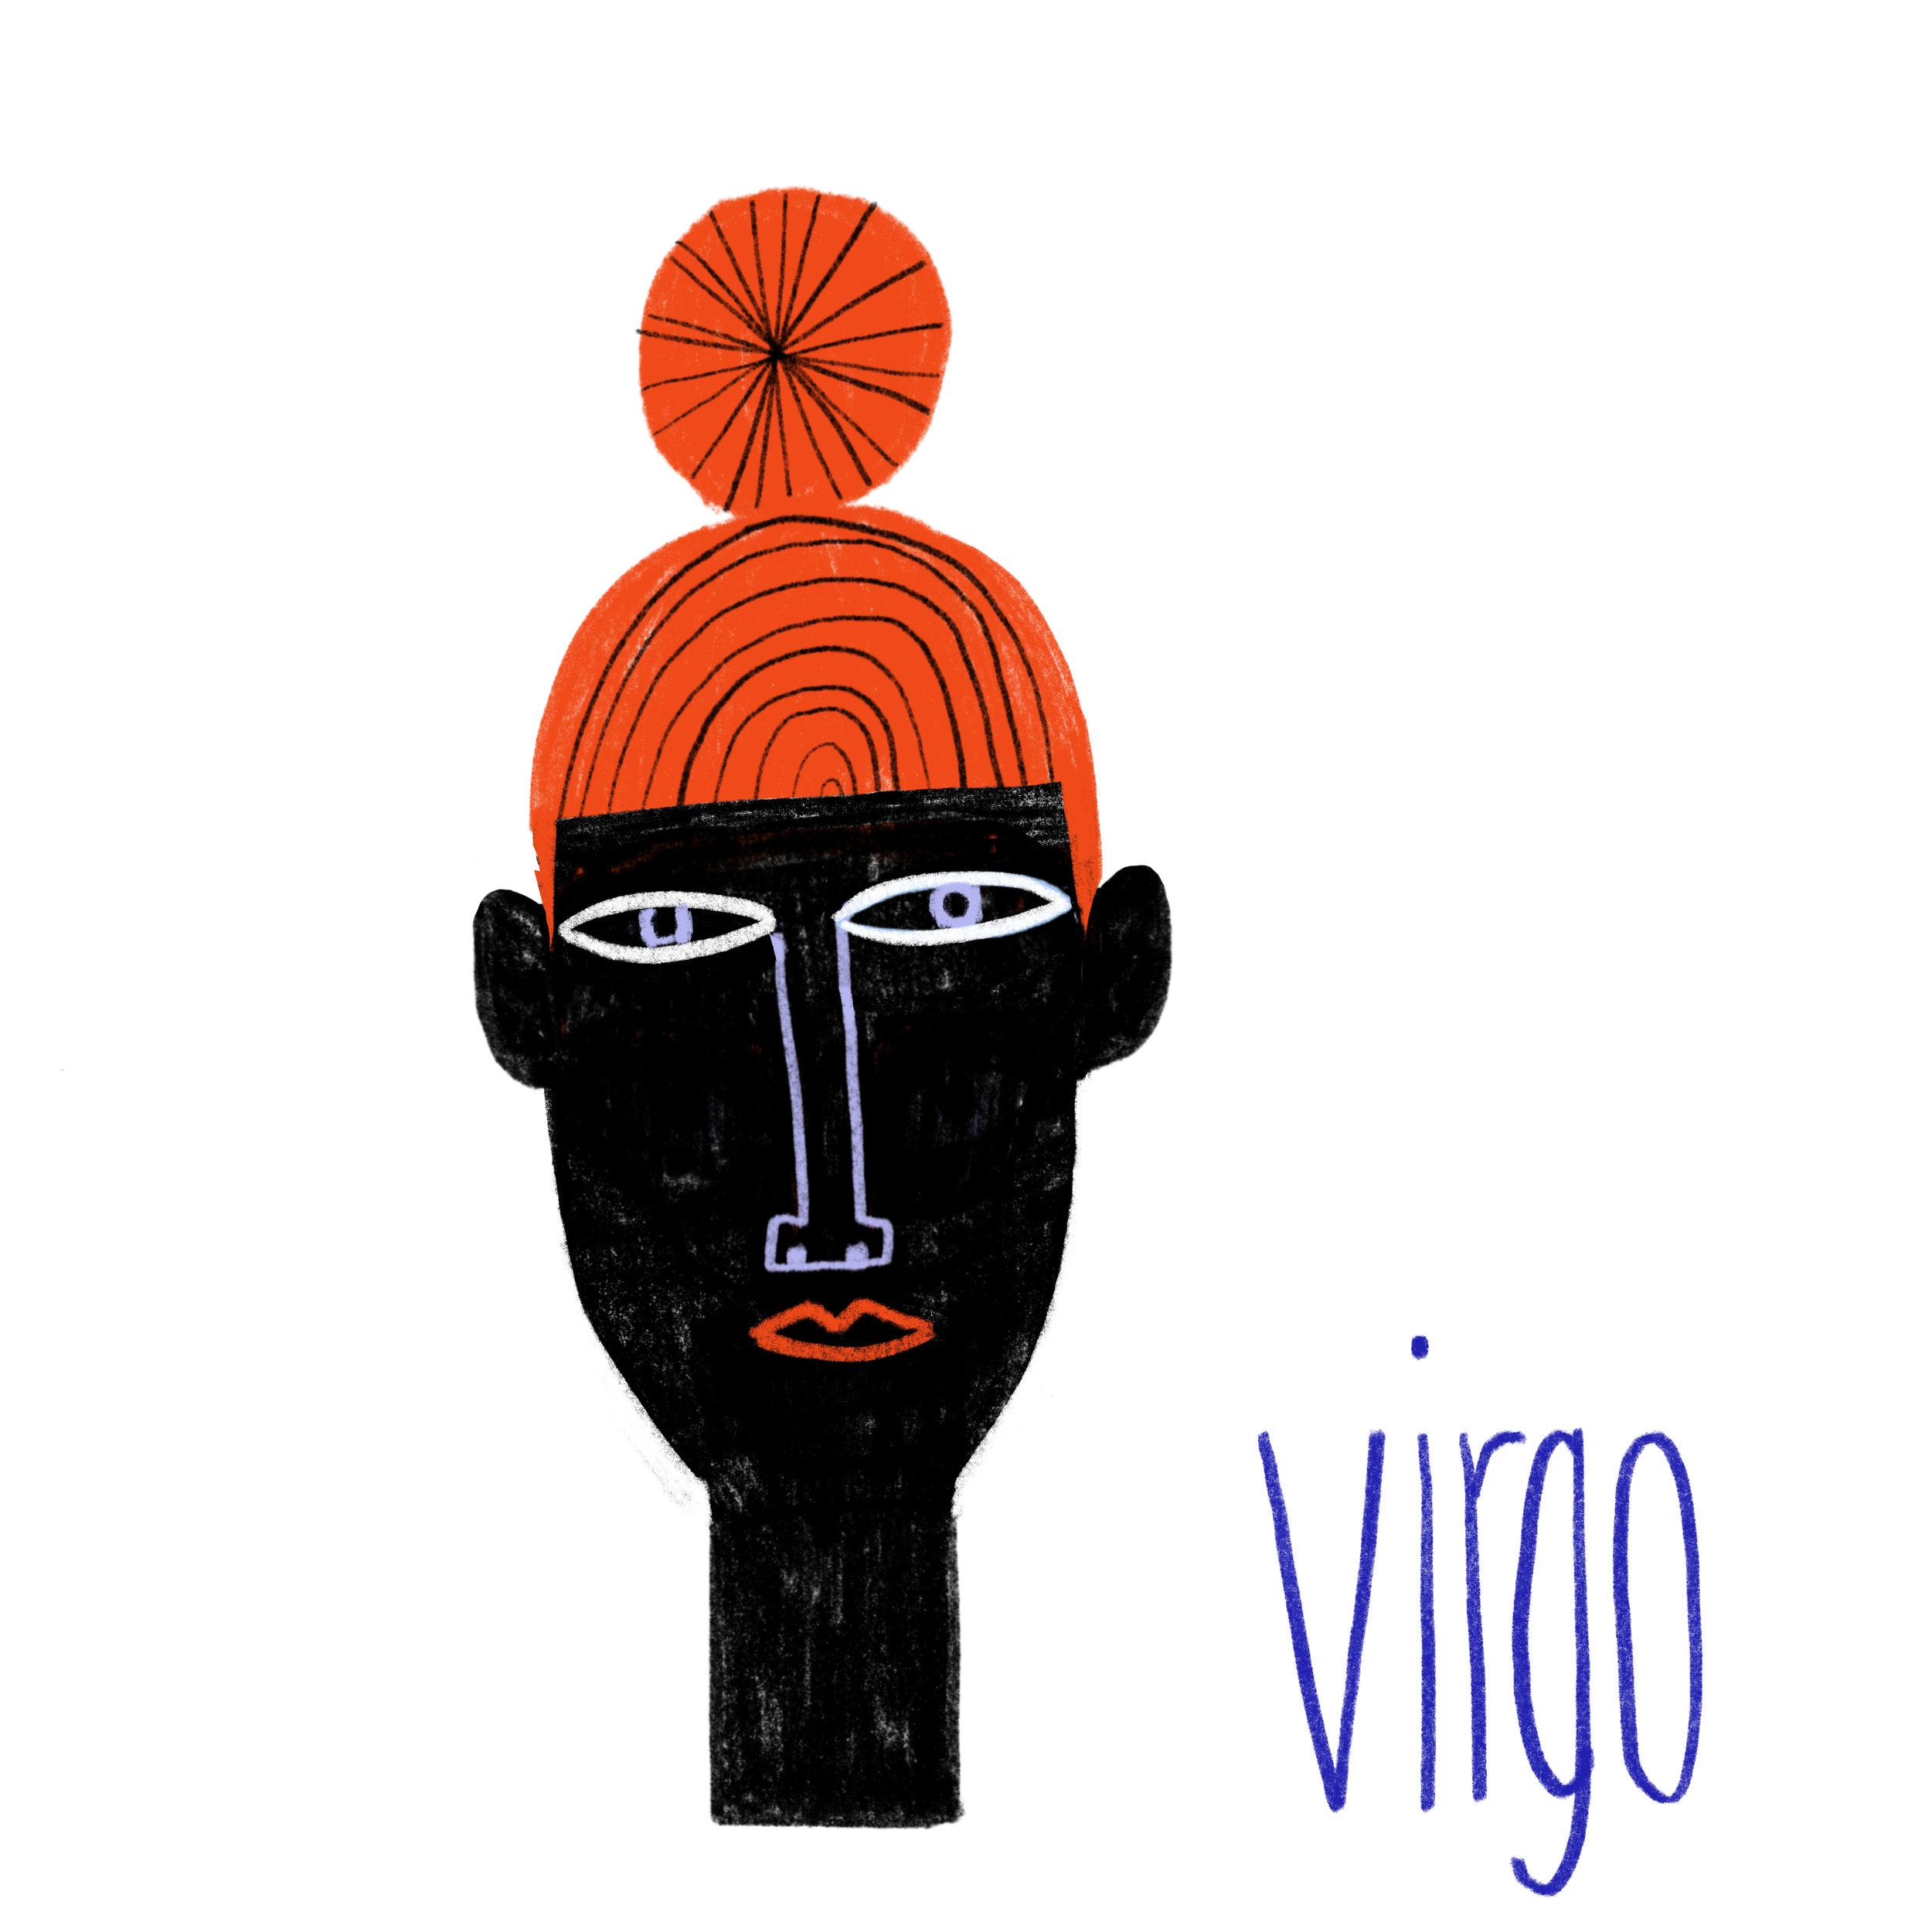 Virgo-1.jpg